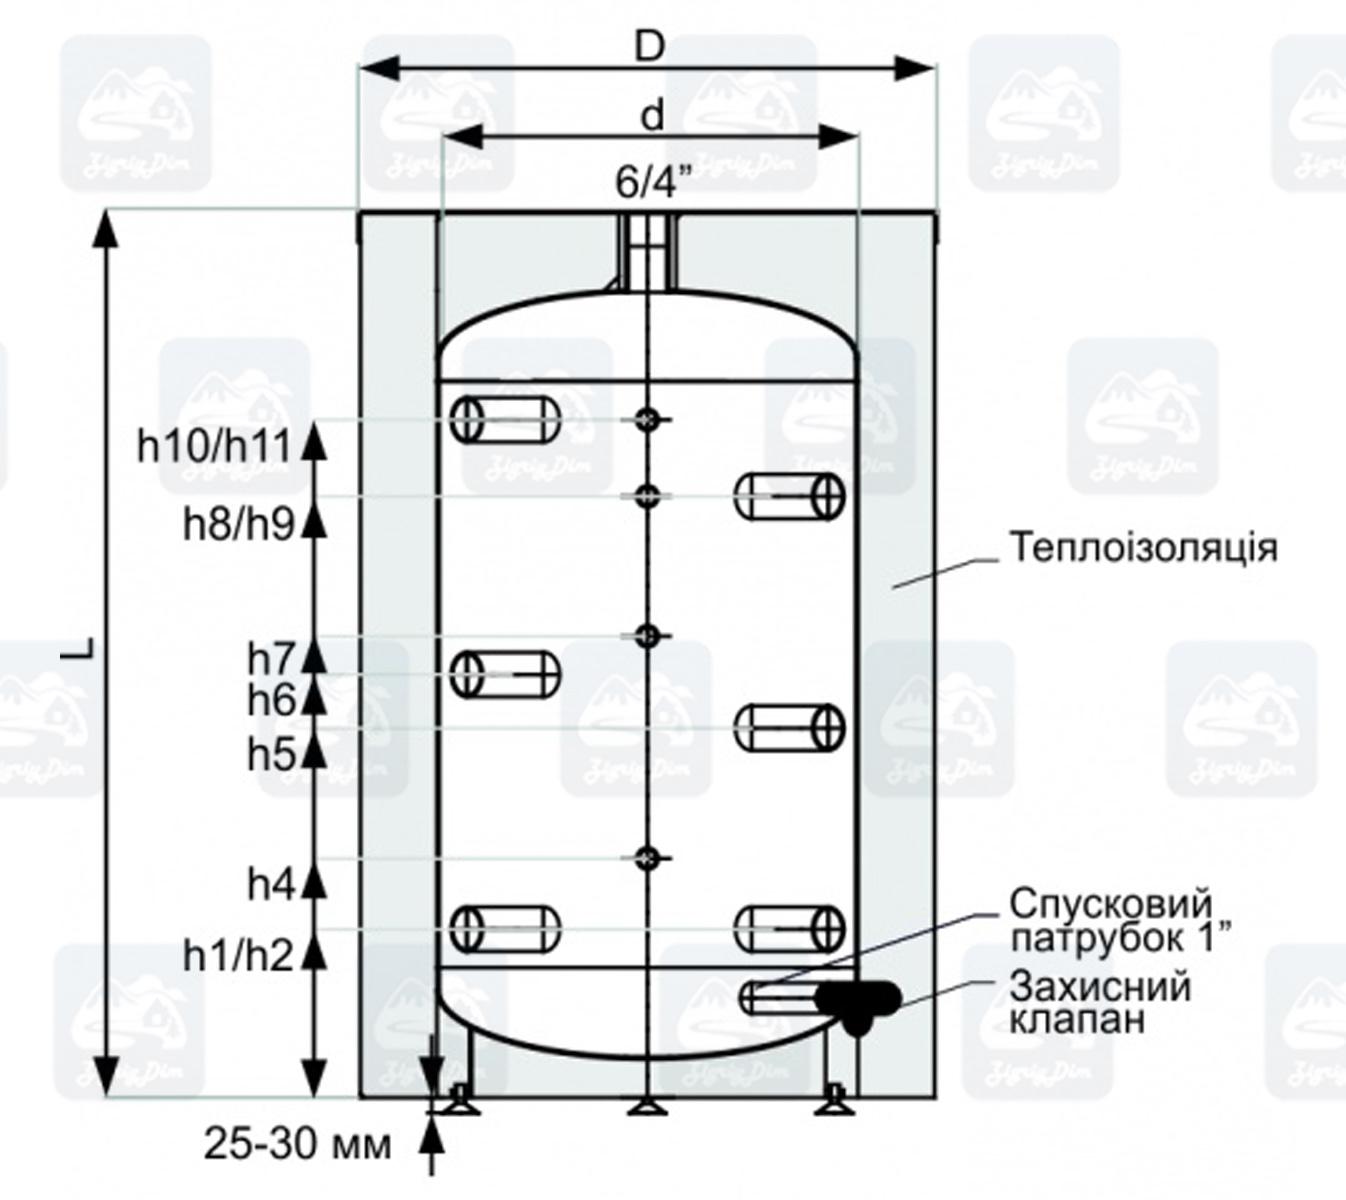 Схема теплоаккумулятора Galmet-Bufor-SG(B) 200